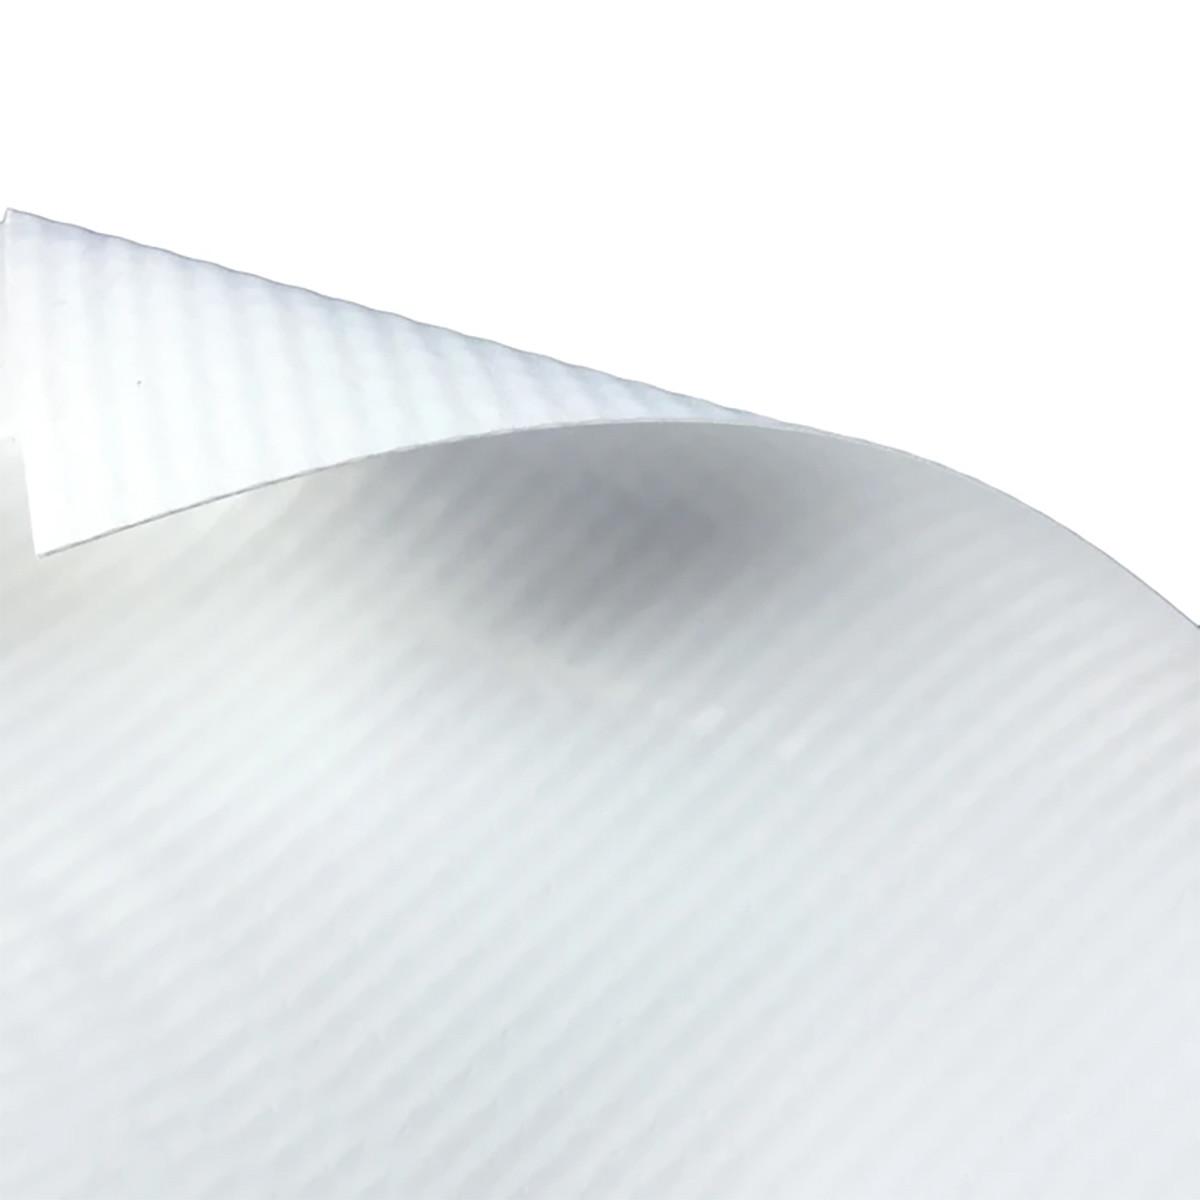 Frontlit baner 1.02x50m 440g mat